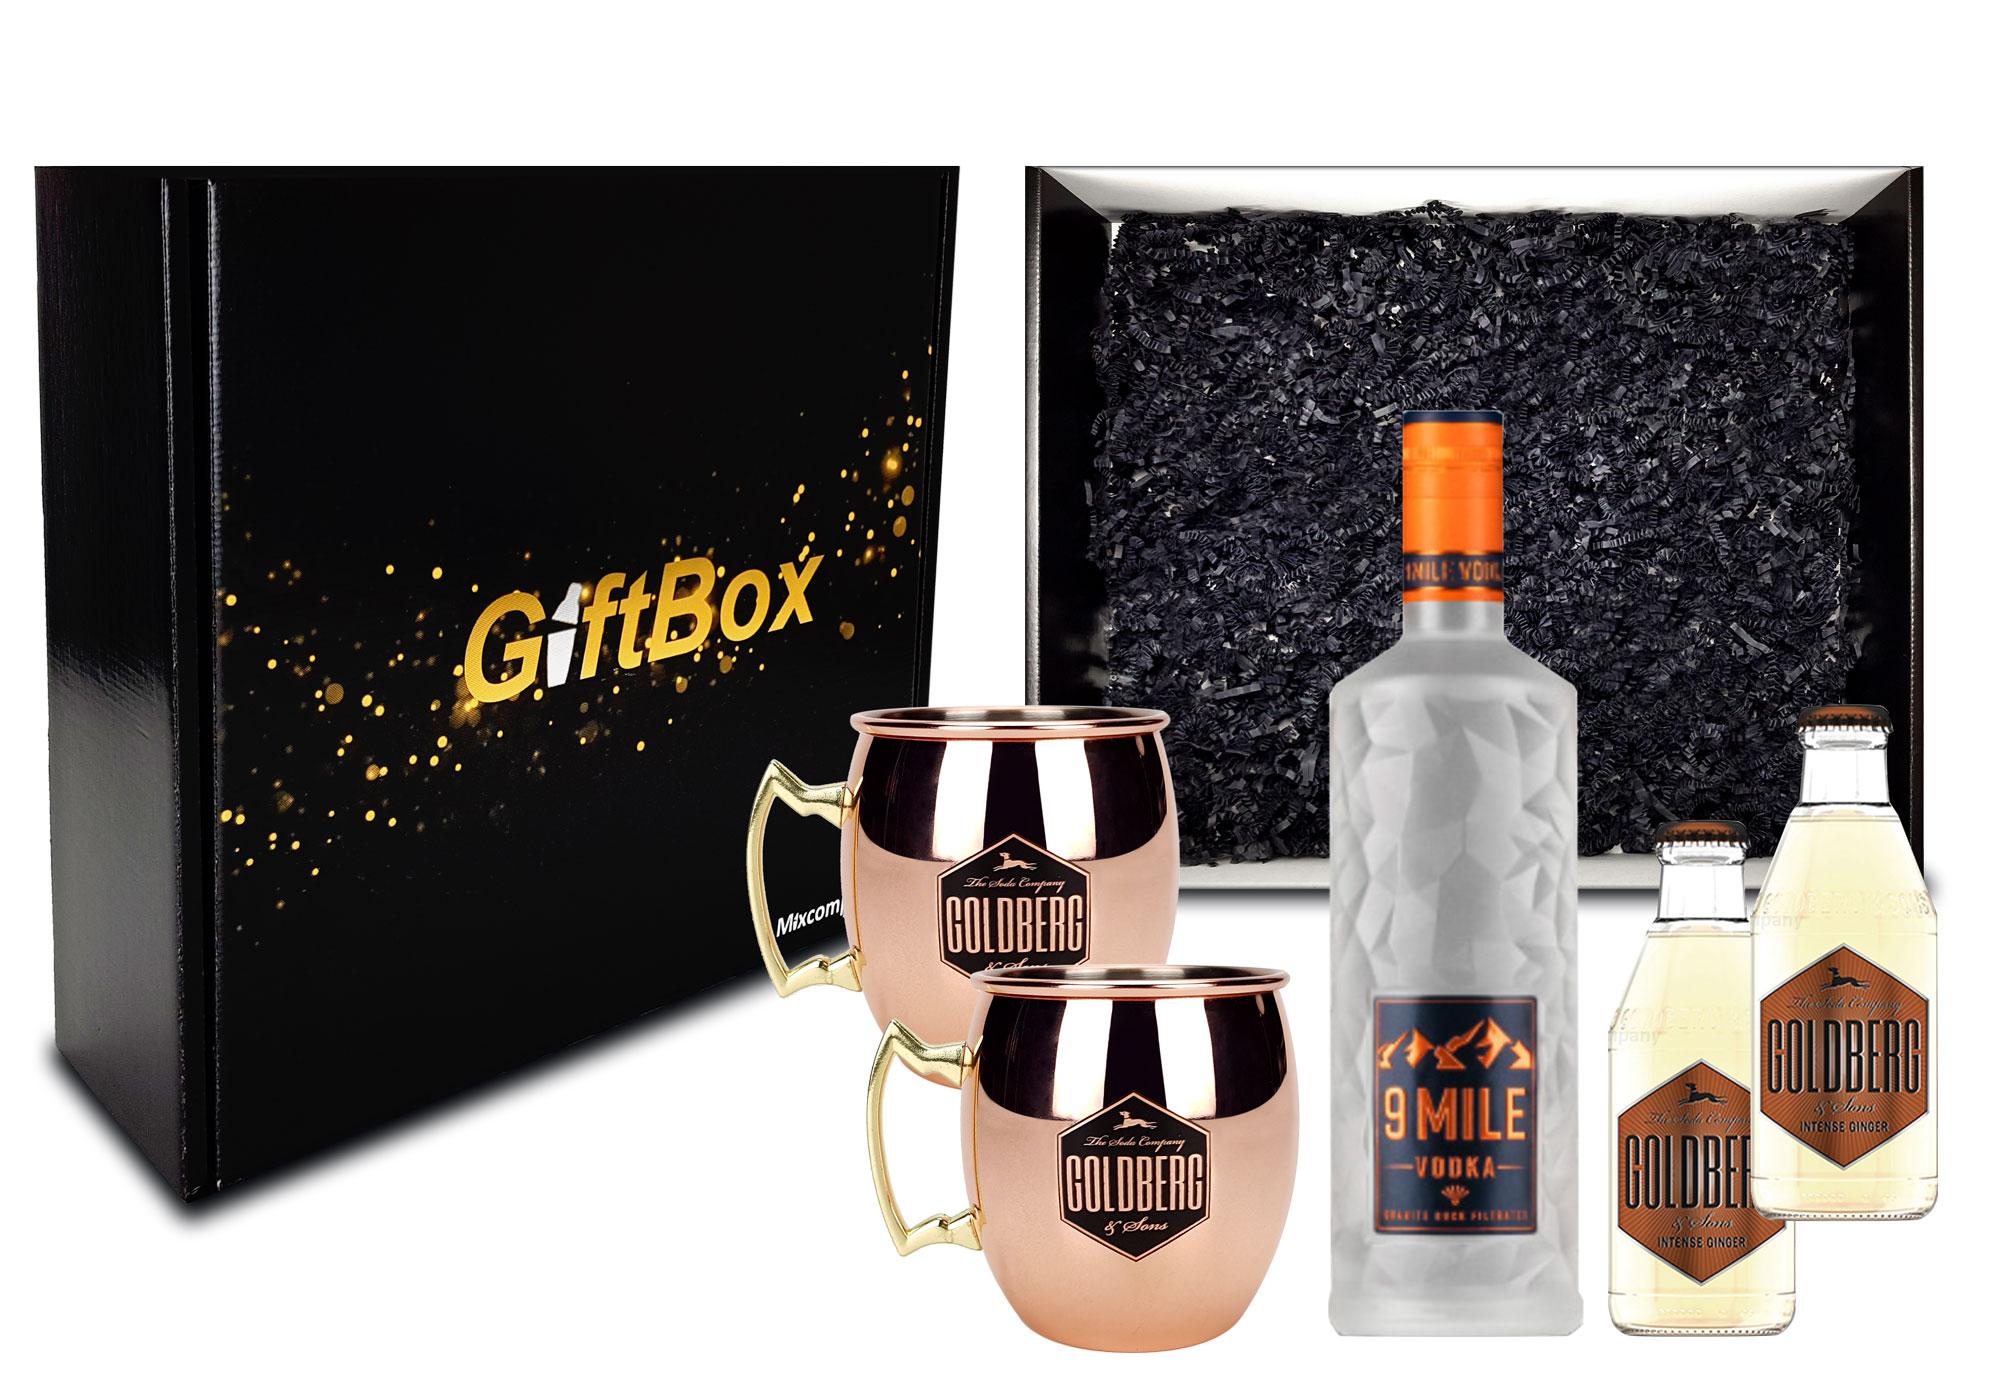 Moscow Mule Set Giftbox Geschenk Box Geschenkset 9 Mile Vodka Wodka 0,7l (37,5% Vol) LED beleuchtet + 2x Goldberg Kupferbecher + 2x Goldberg Intense Ginger 200ml - Inkl. Pfand MEHRWEG- [Enthält Sulfite]